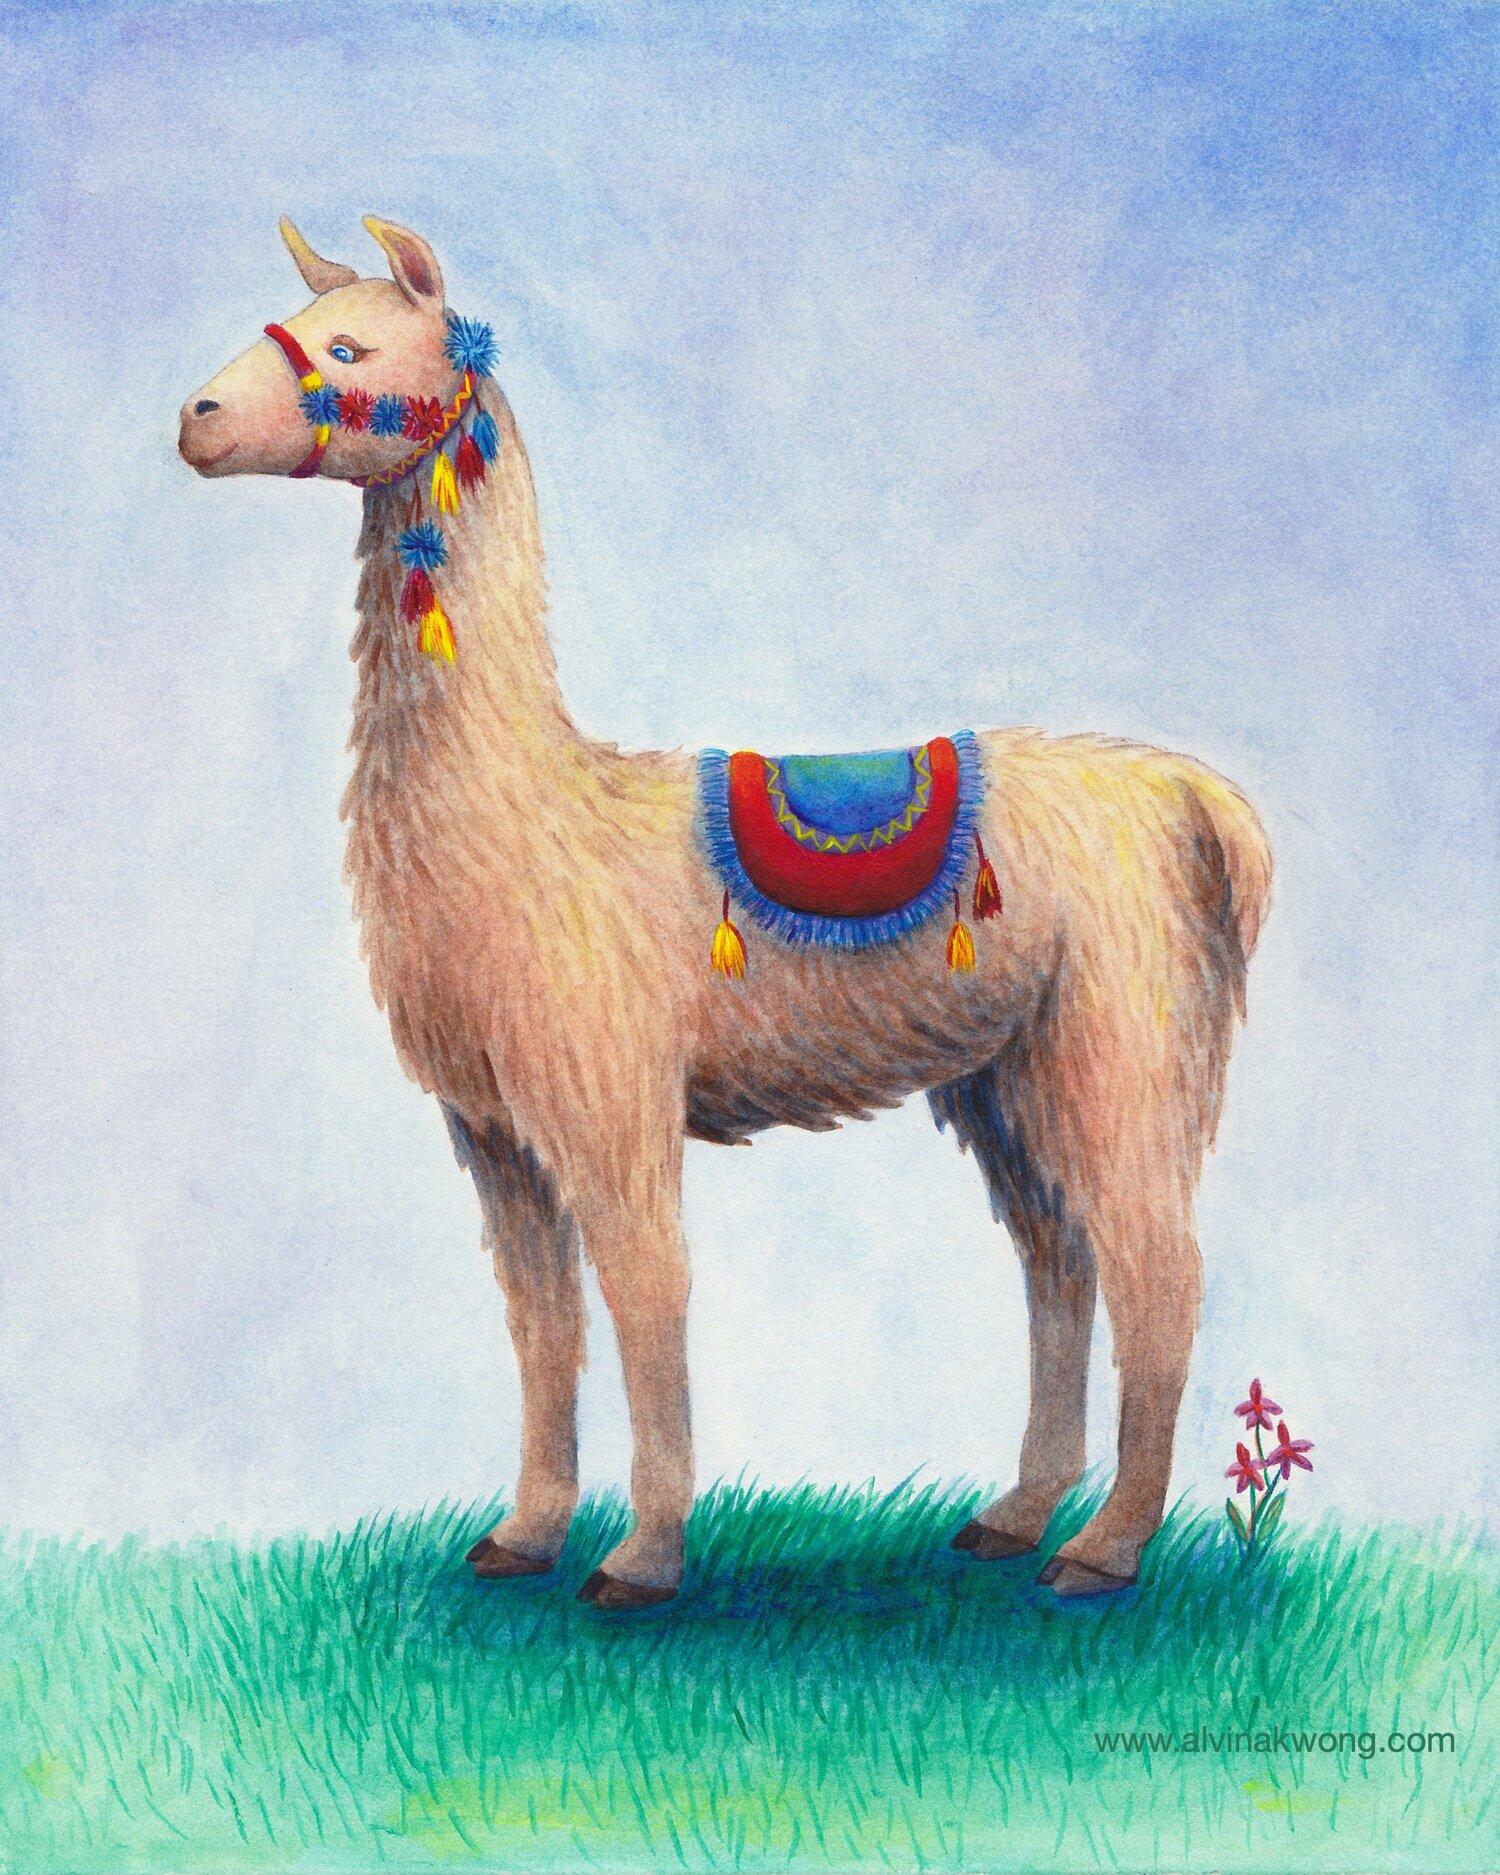 Llama Peru WEB.jpg